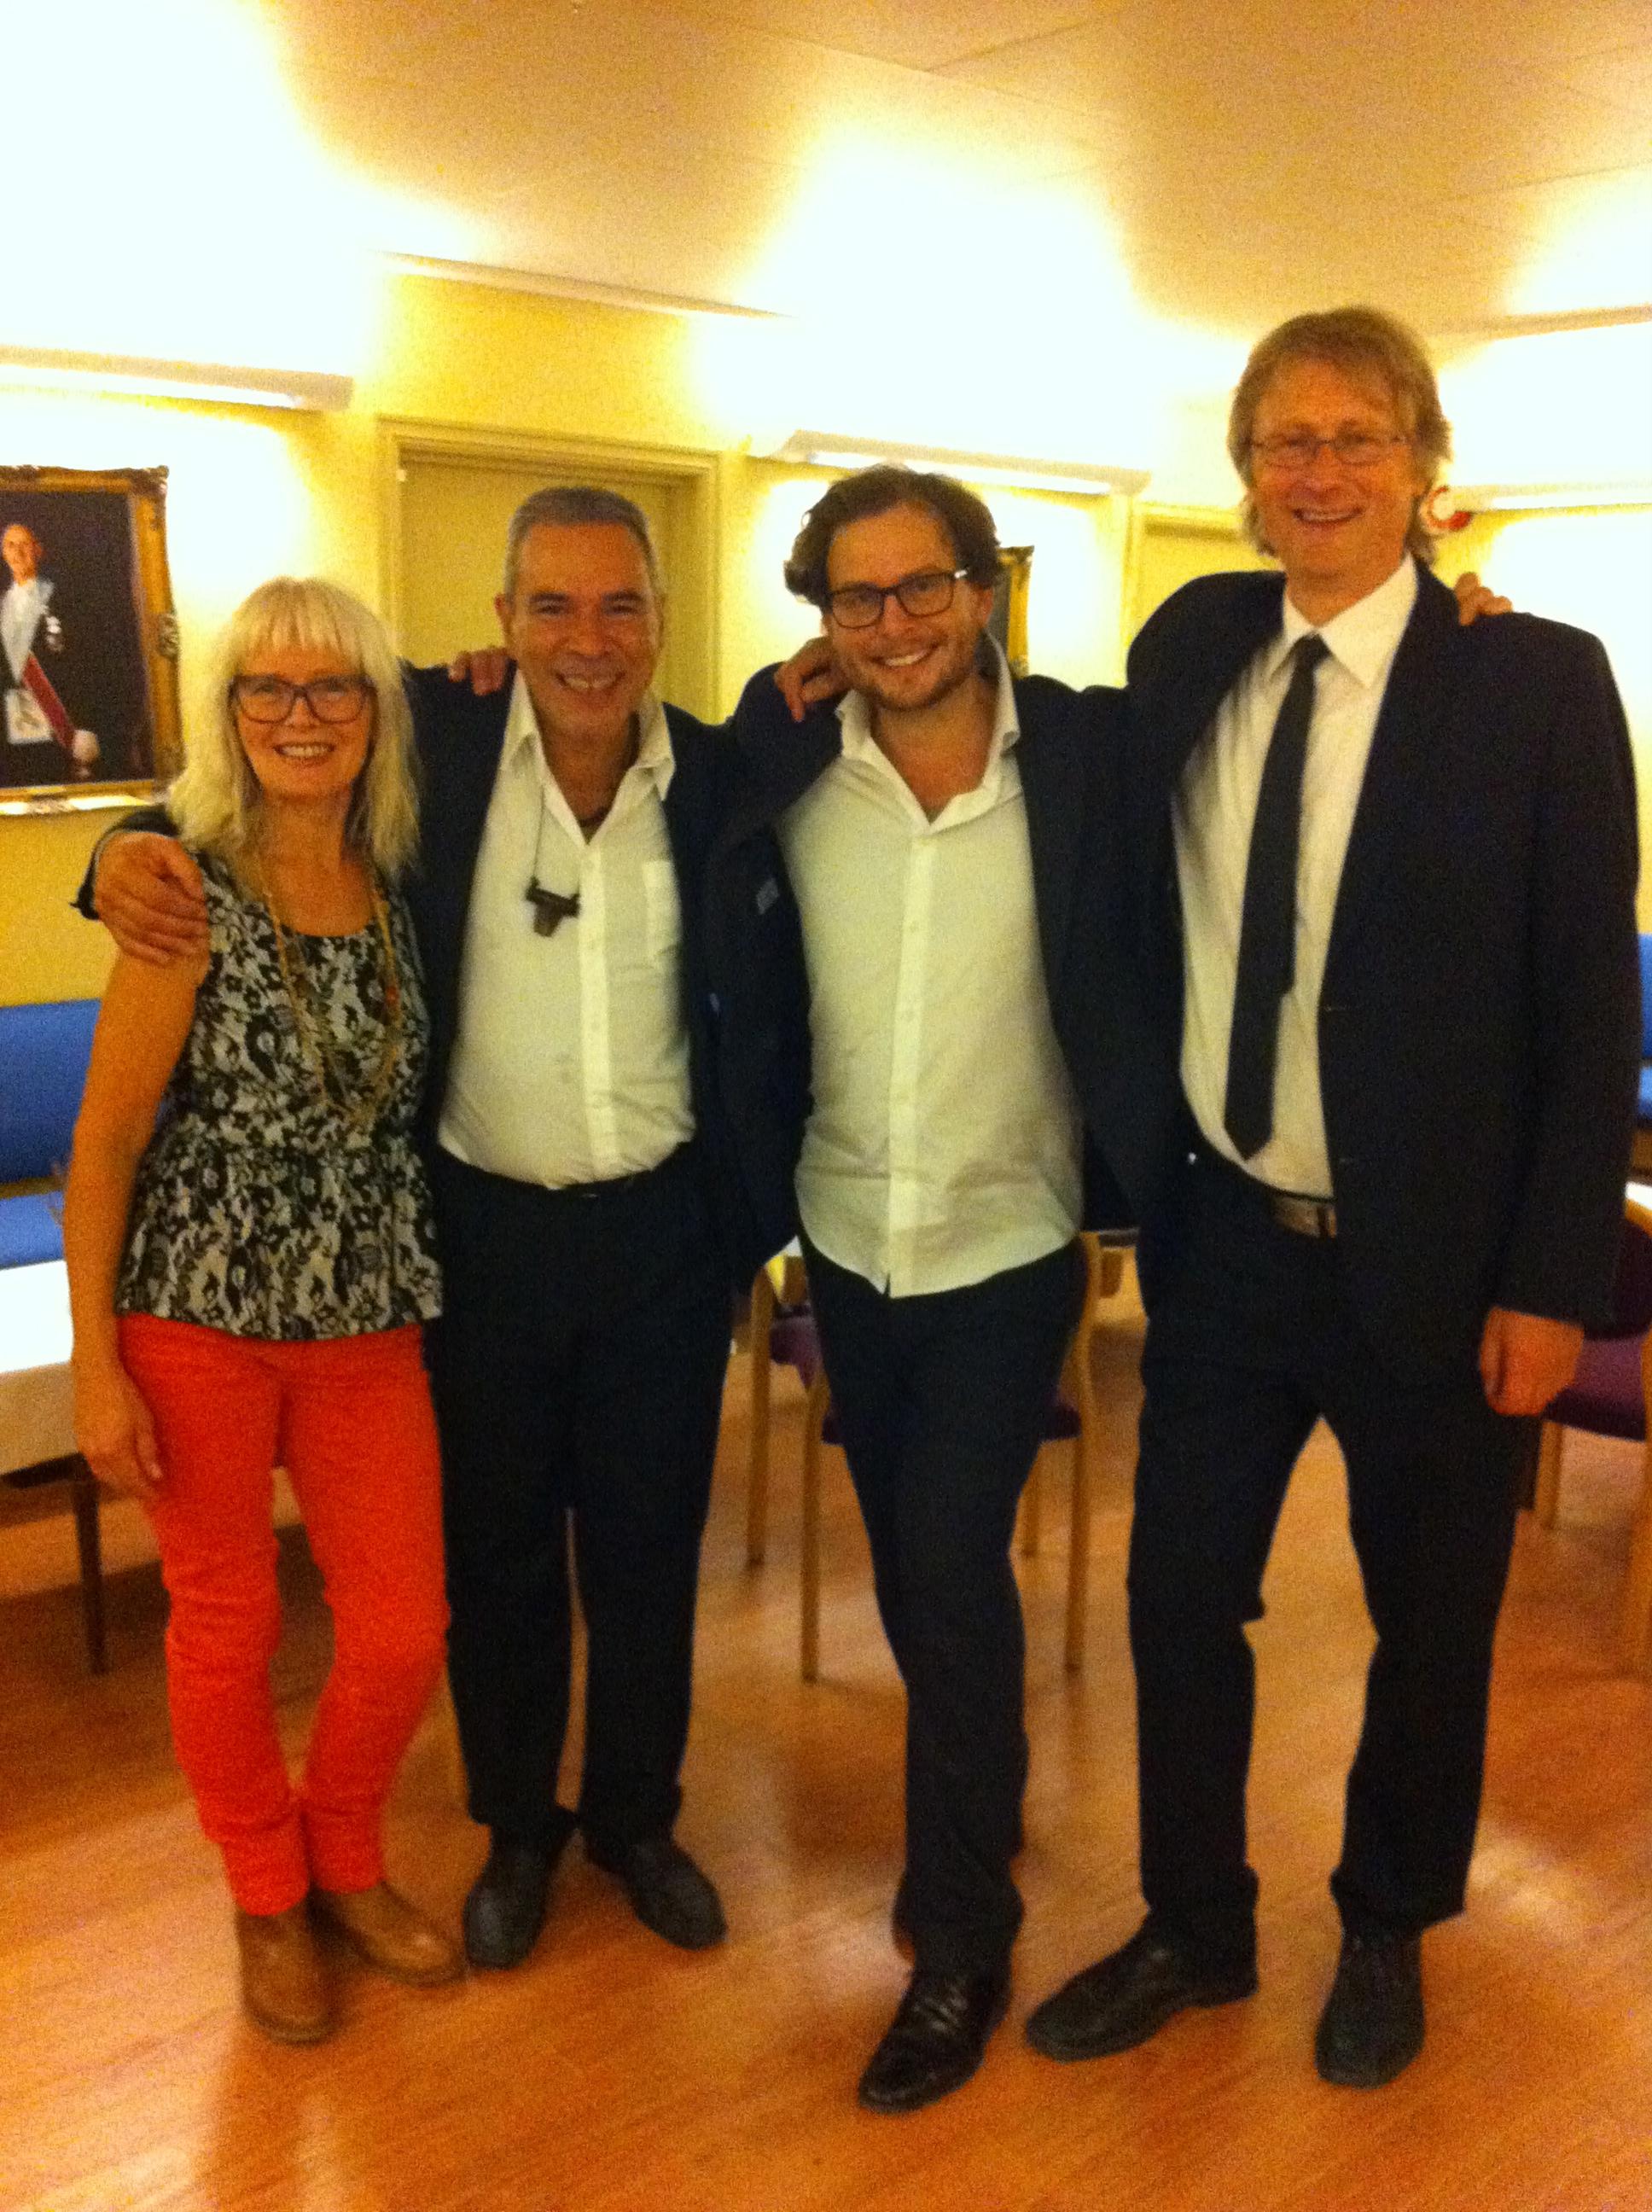 MS, Celio de Carvalho, Ola Rokkones, Øystein Norvoll, 2013.